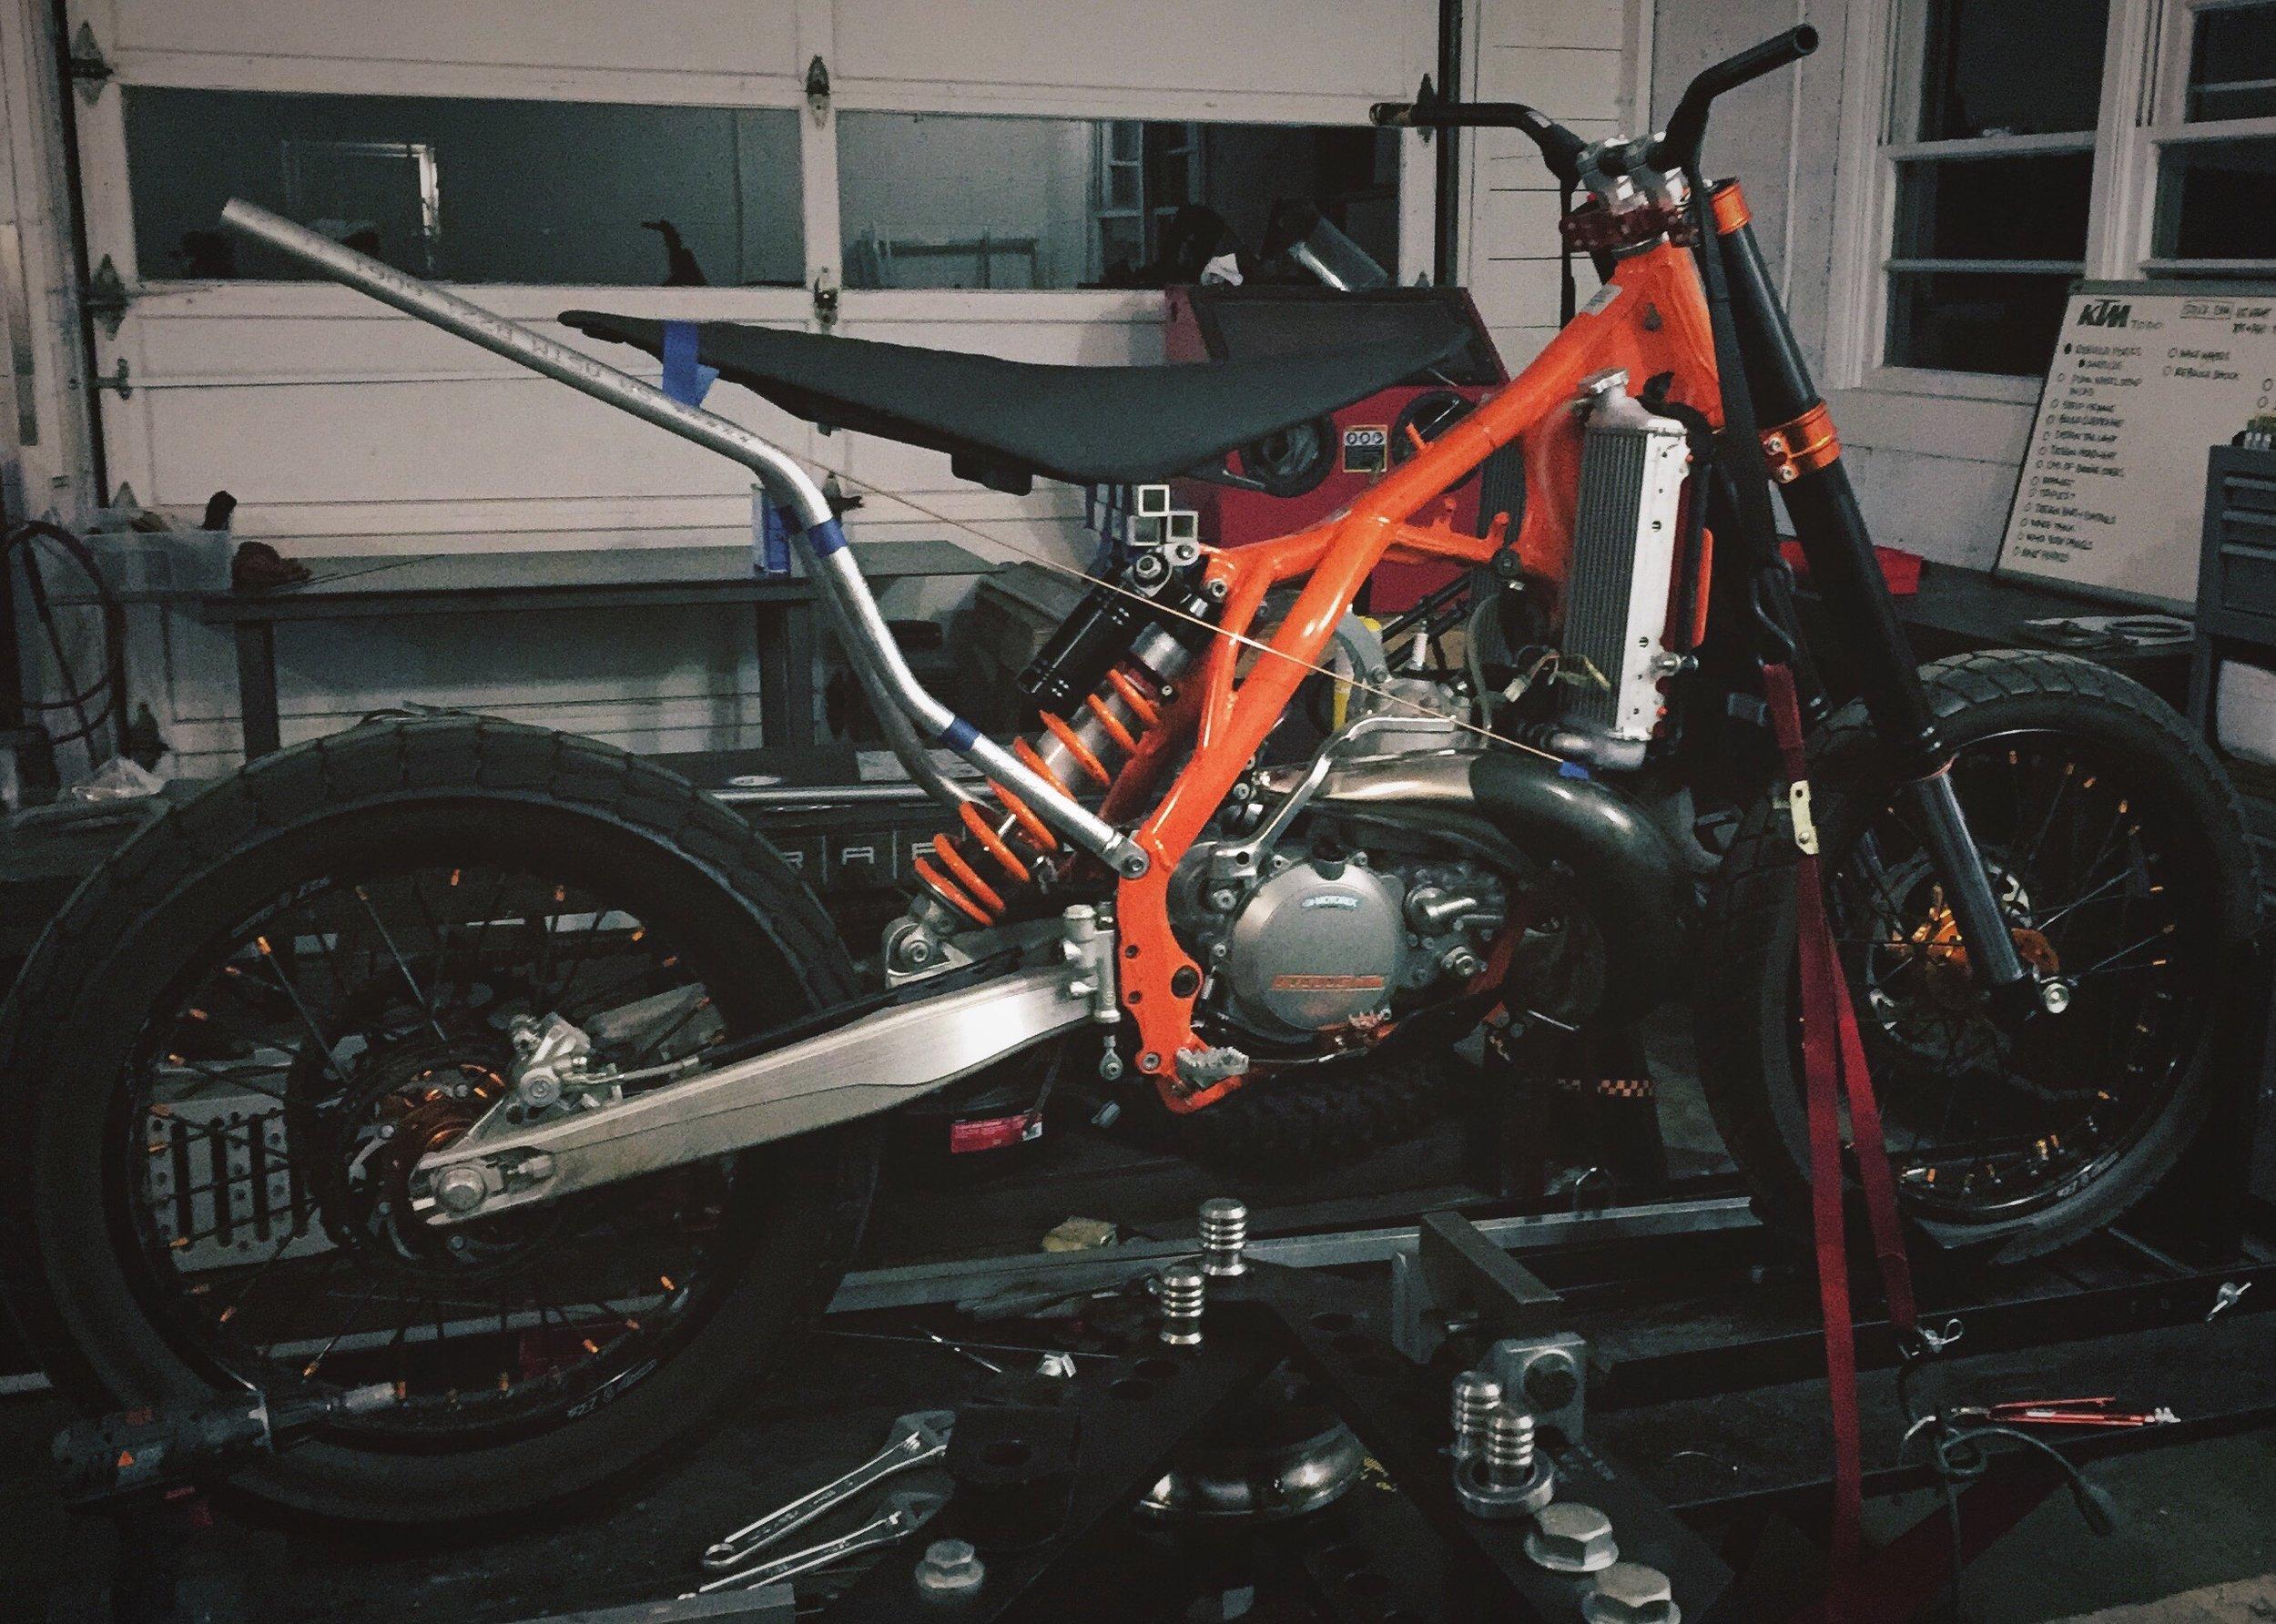 Moto-Mucci_Custom_KTM_300_Build (7).jpg